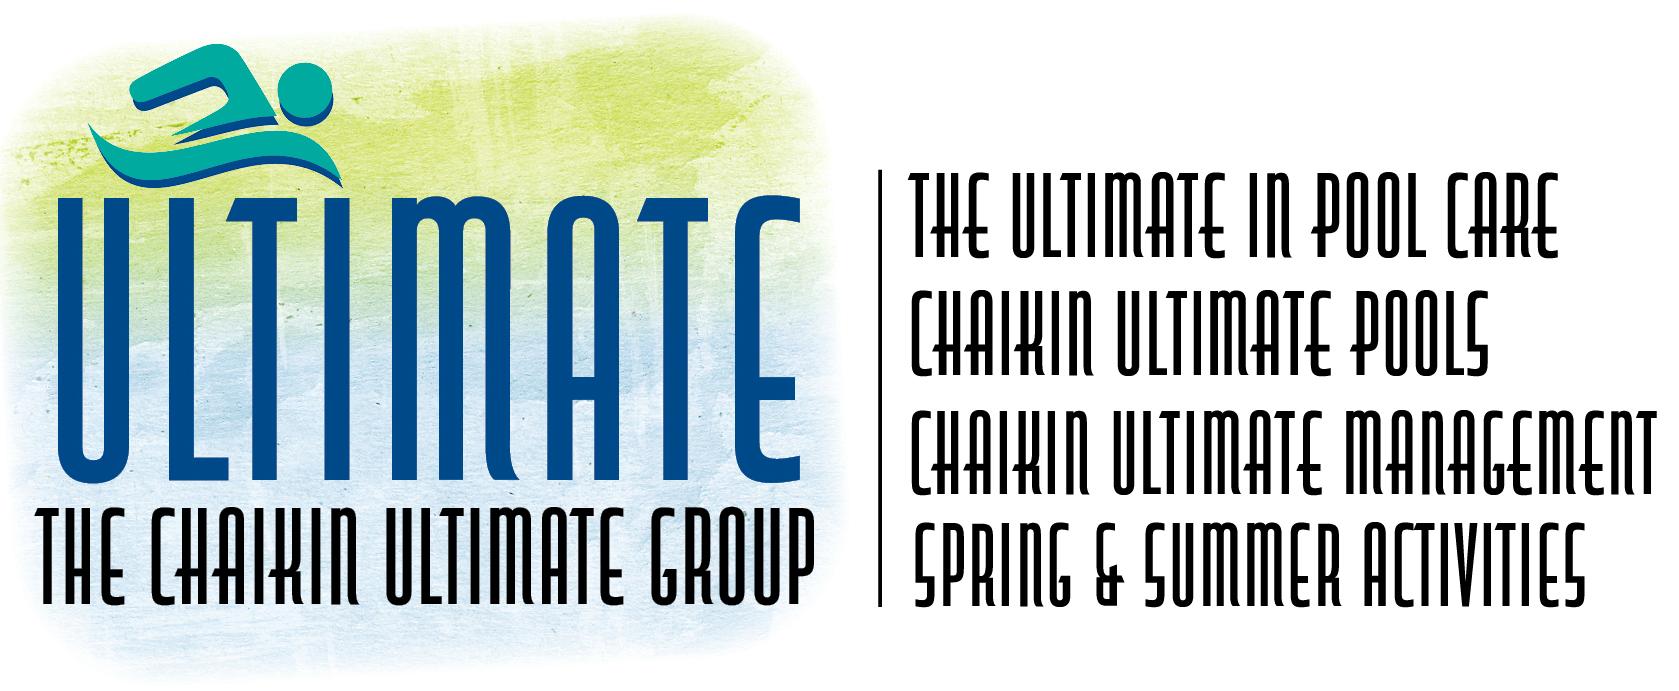 Chaikin Ultimate Group Logo